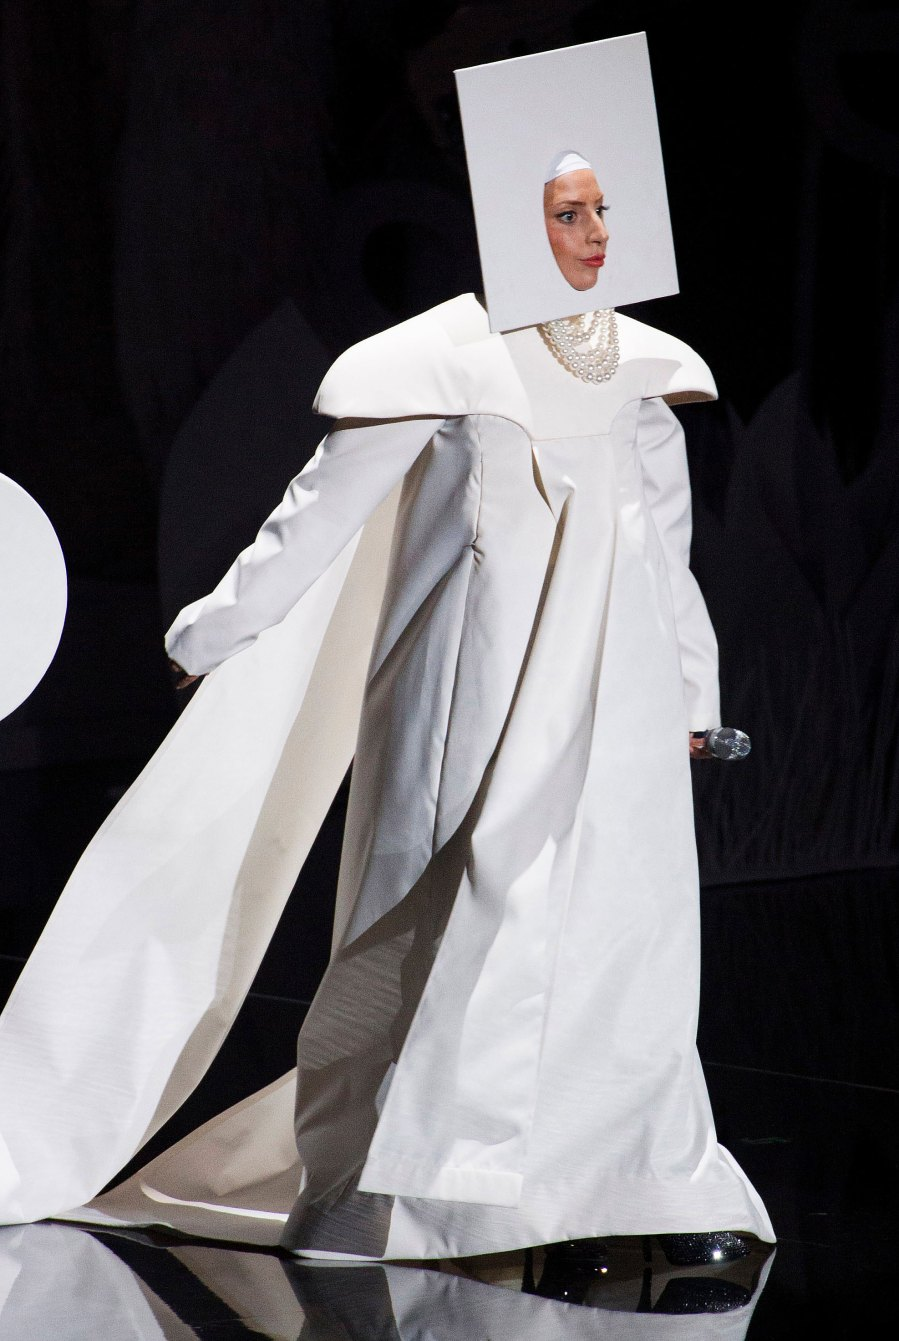 Lady Gaga Craziest VMA Looks - 2013